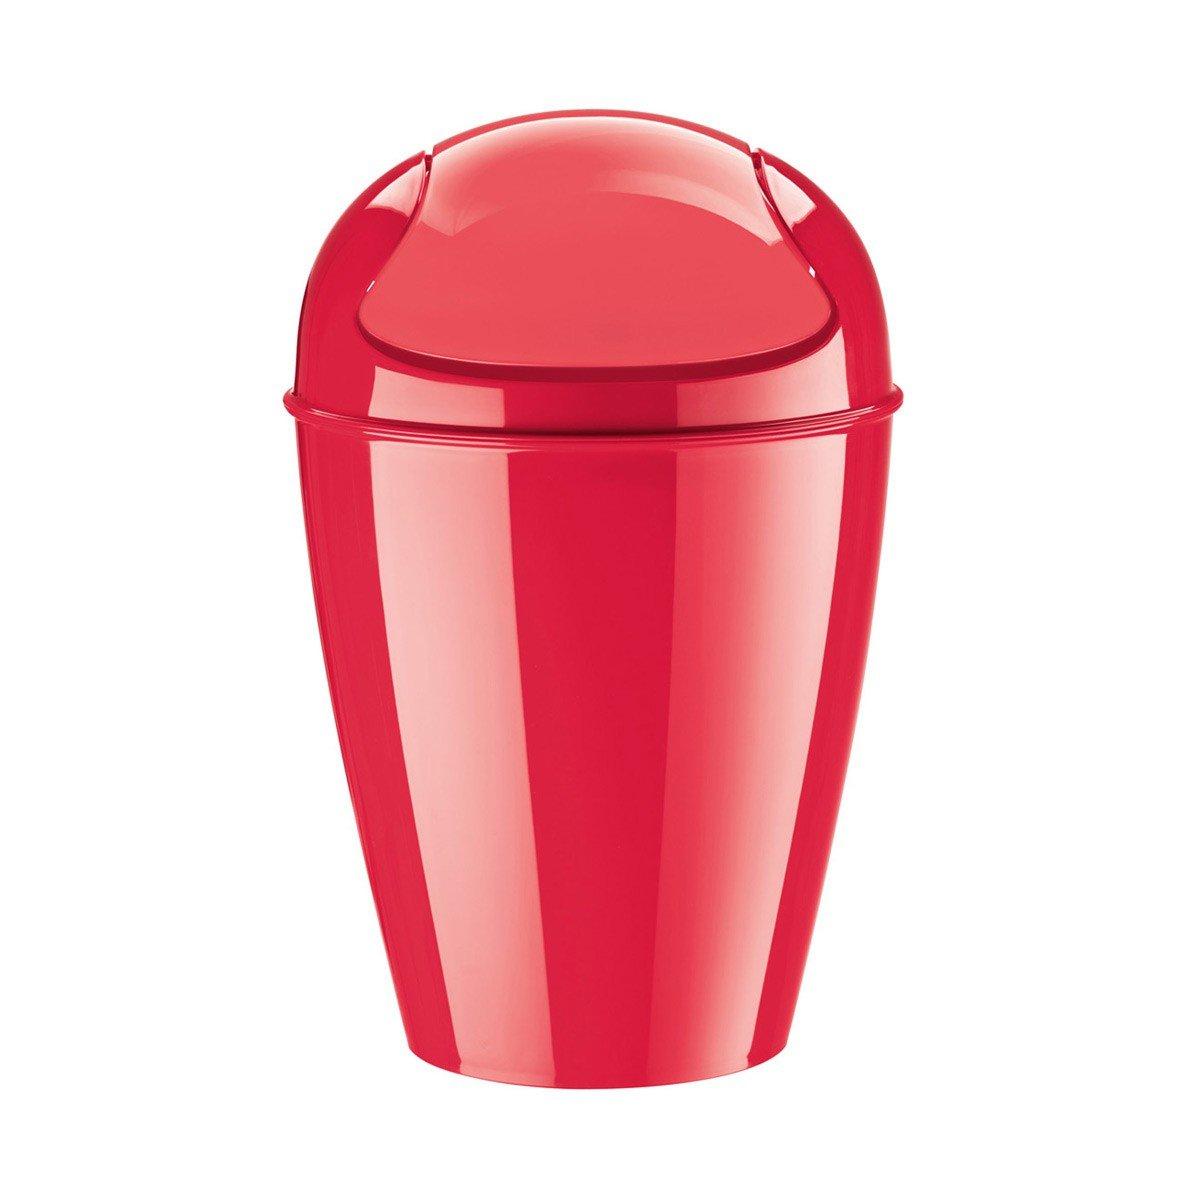 Koziol Del S, Swing-Top Wastebasket, Wastepaper Bin, Accessory, Solid Raspberry Red, 5777583 koziol набор соль перец step n pep koziol оранжевый прозрачный